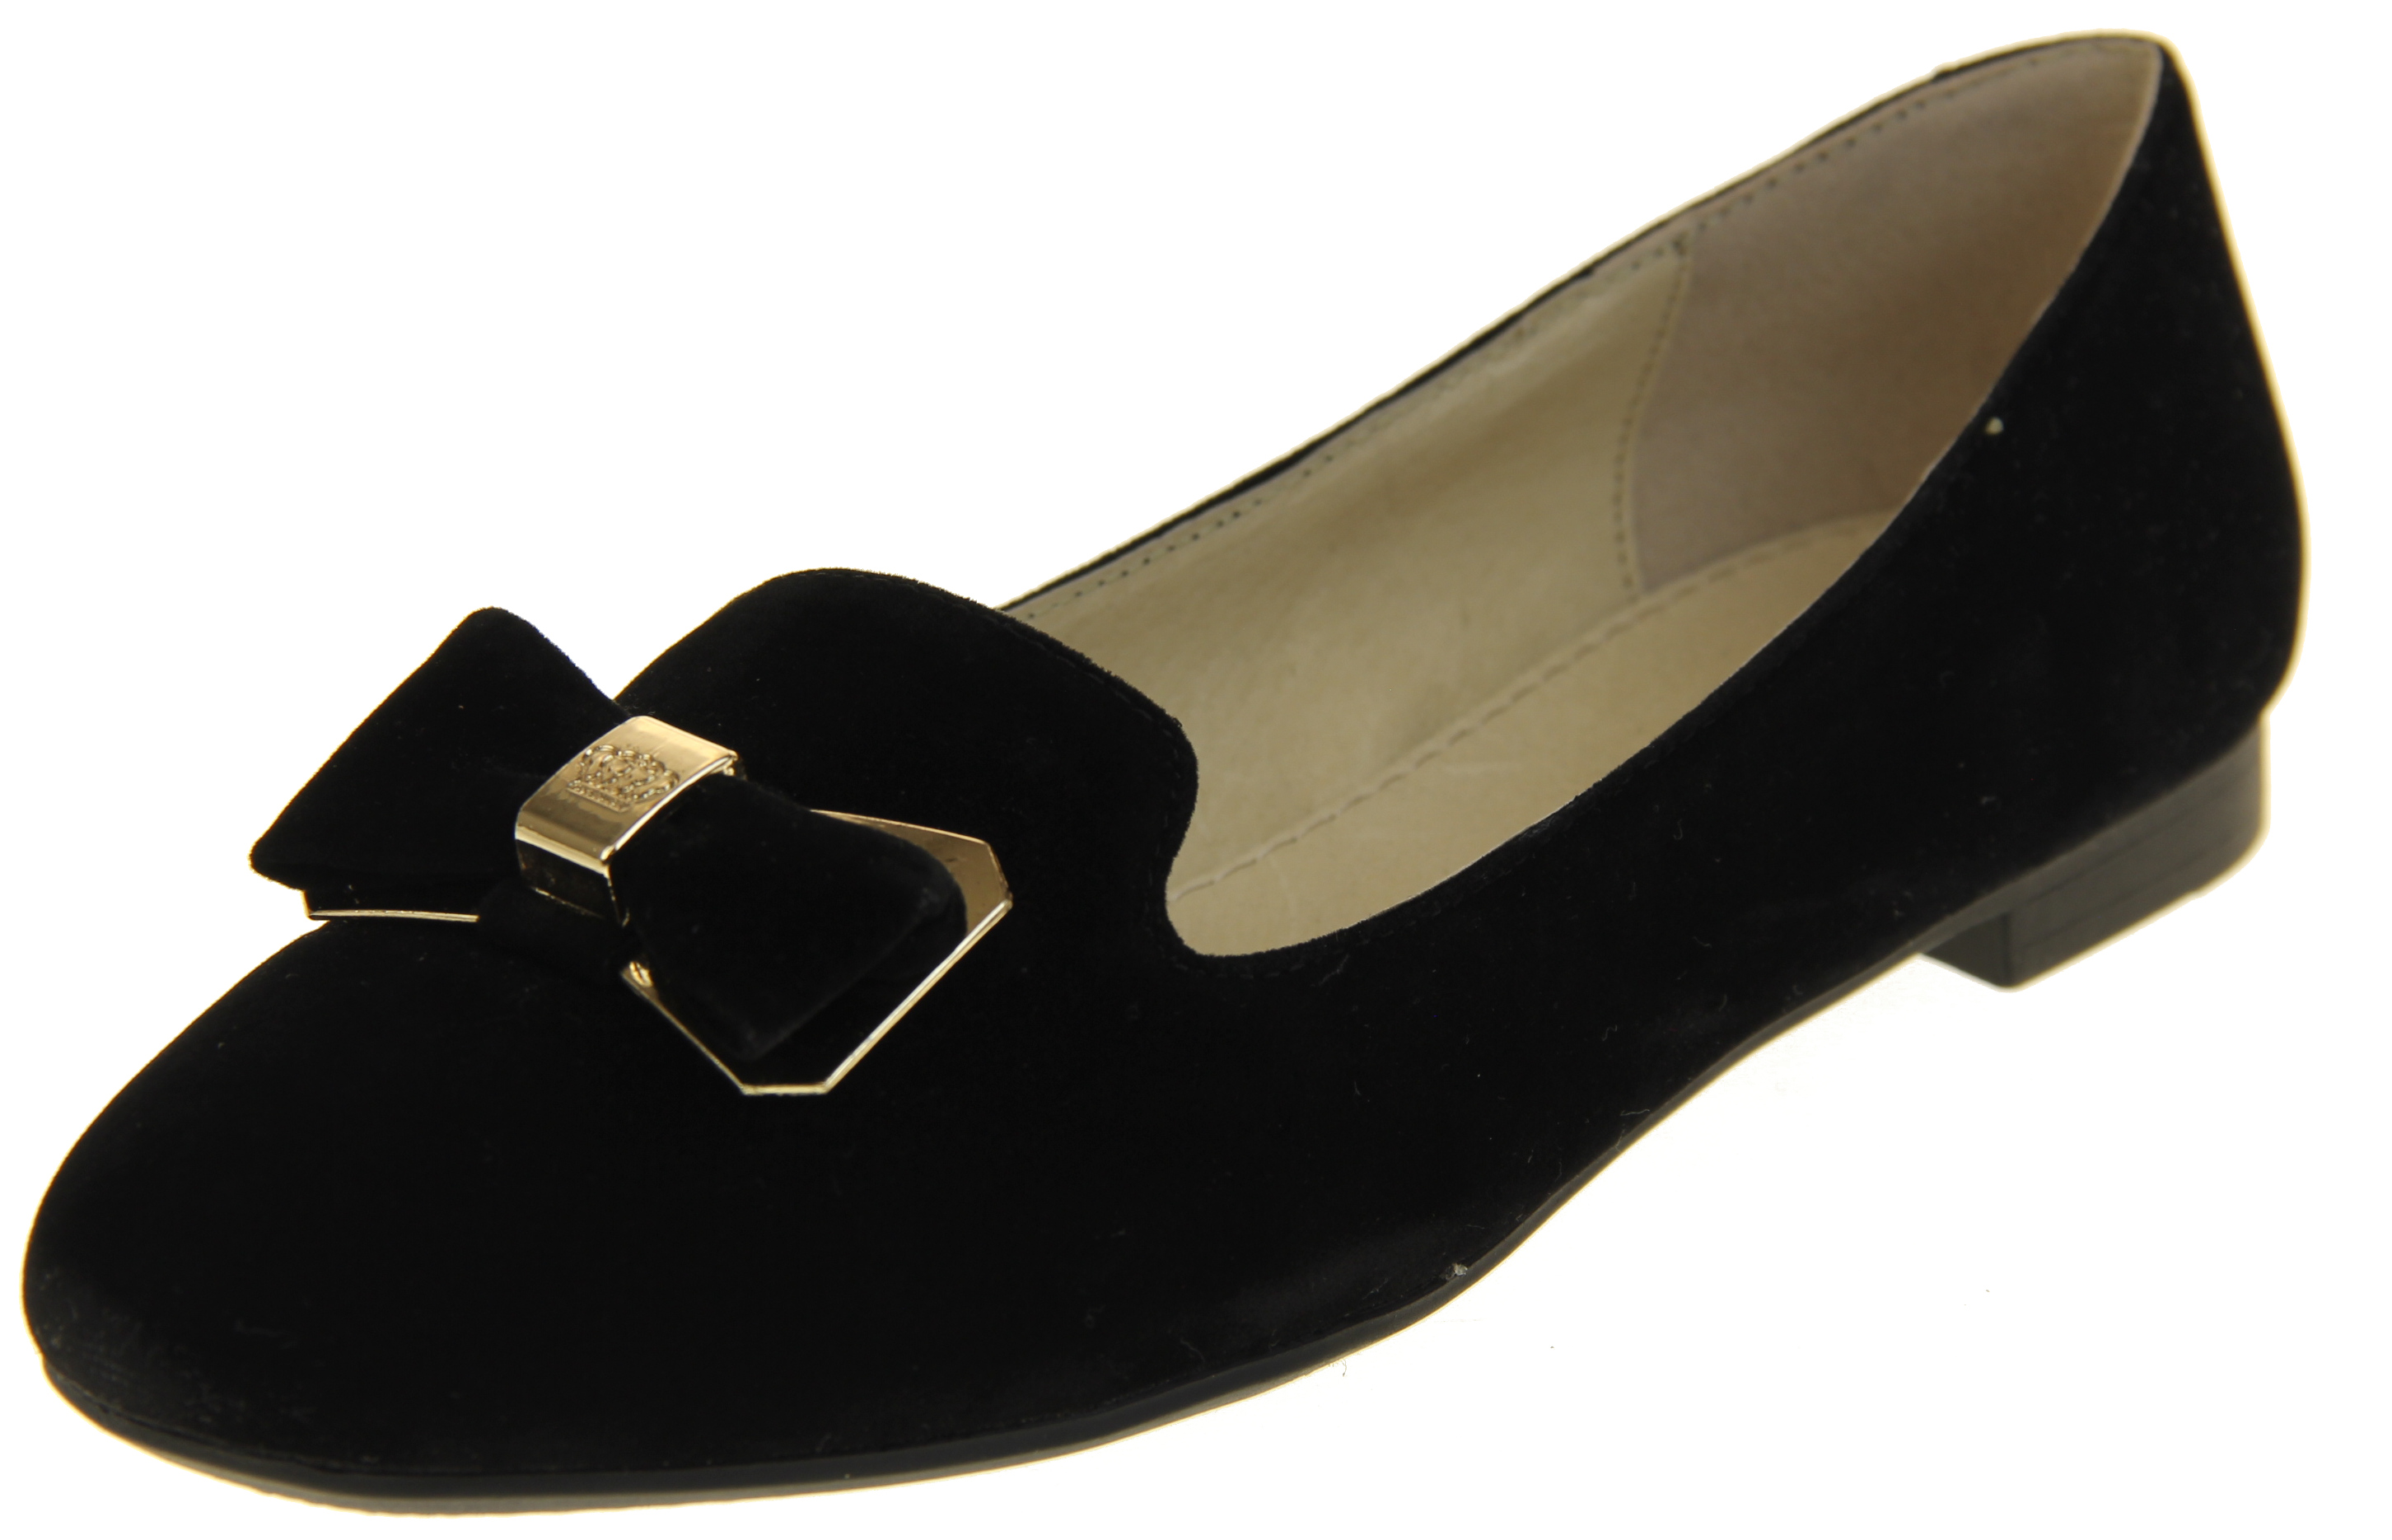 Womens Ladies Keddo Leather Flat Black Smart Loafers Work Ballerinas